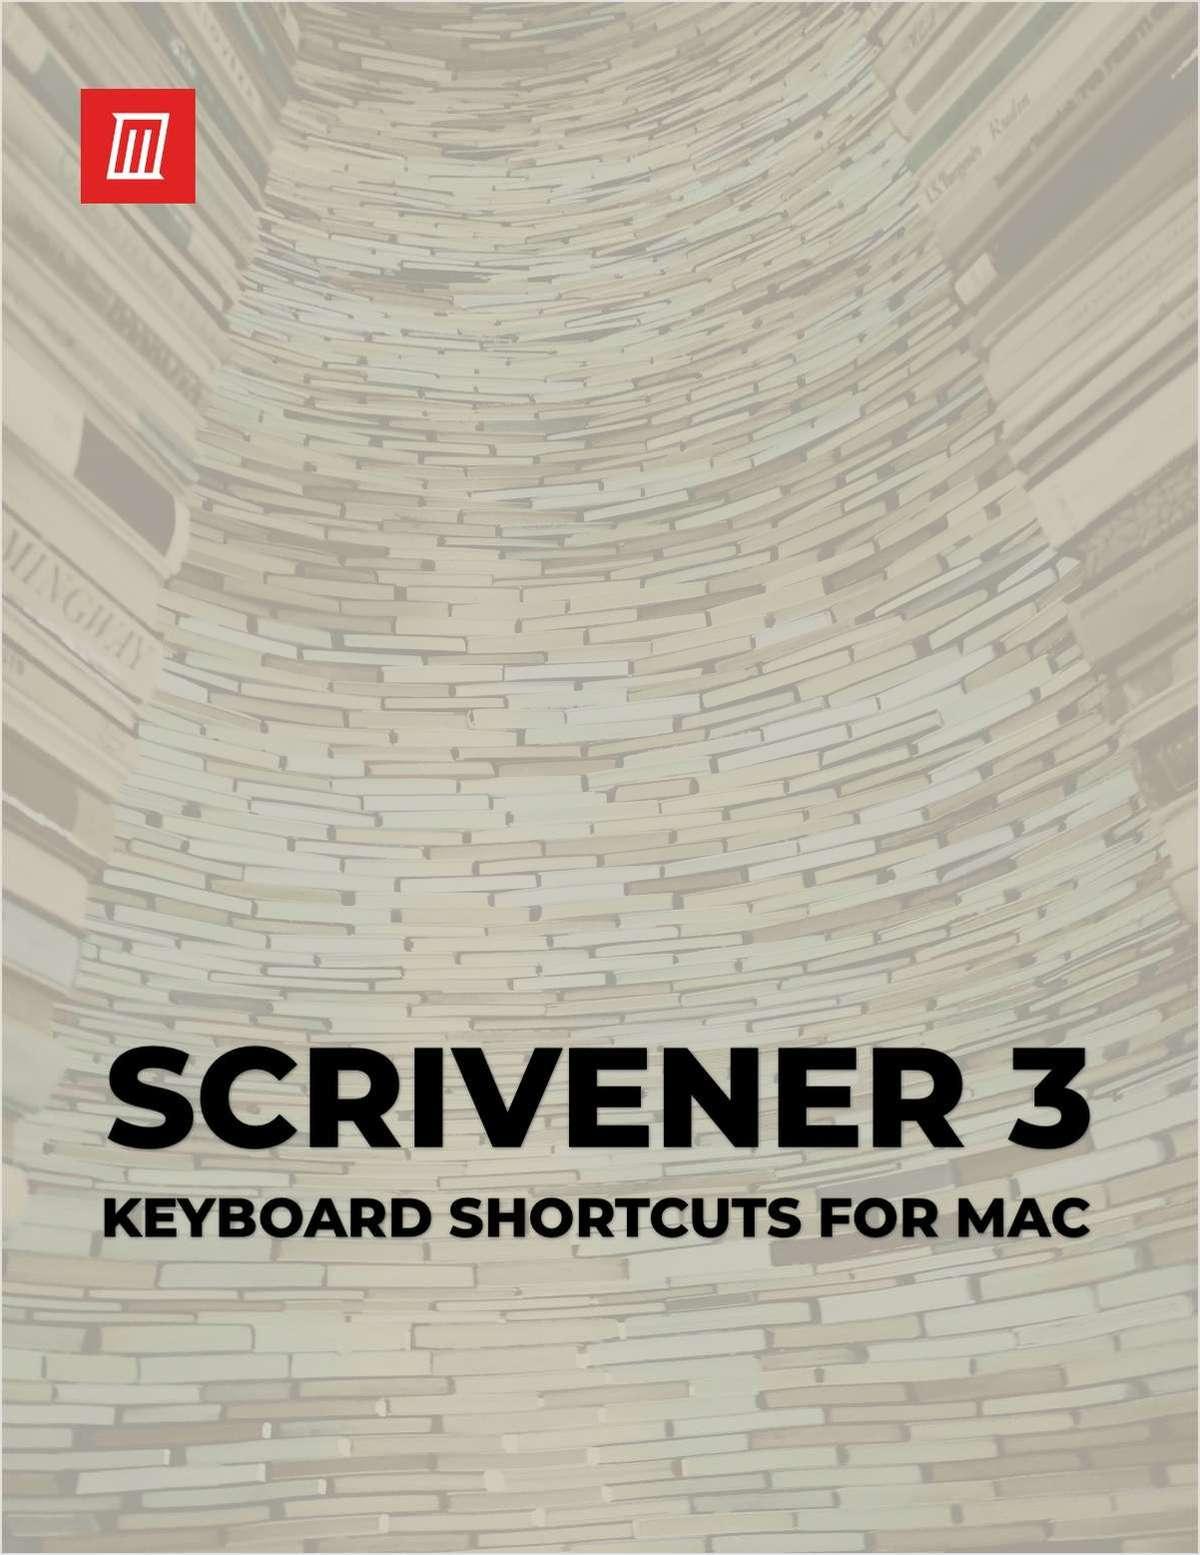 Scrivener 3 Keyboard Shortcuts for Mac